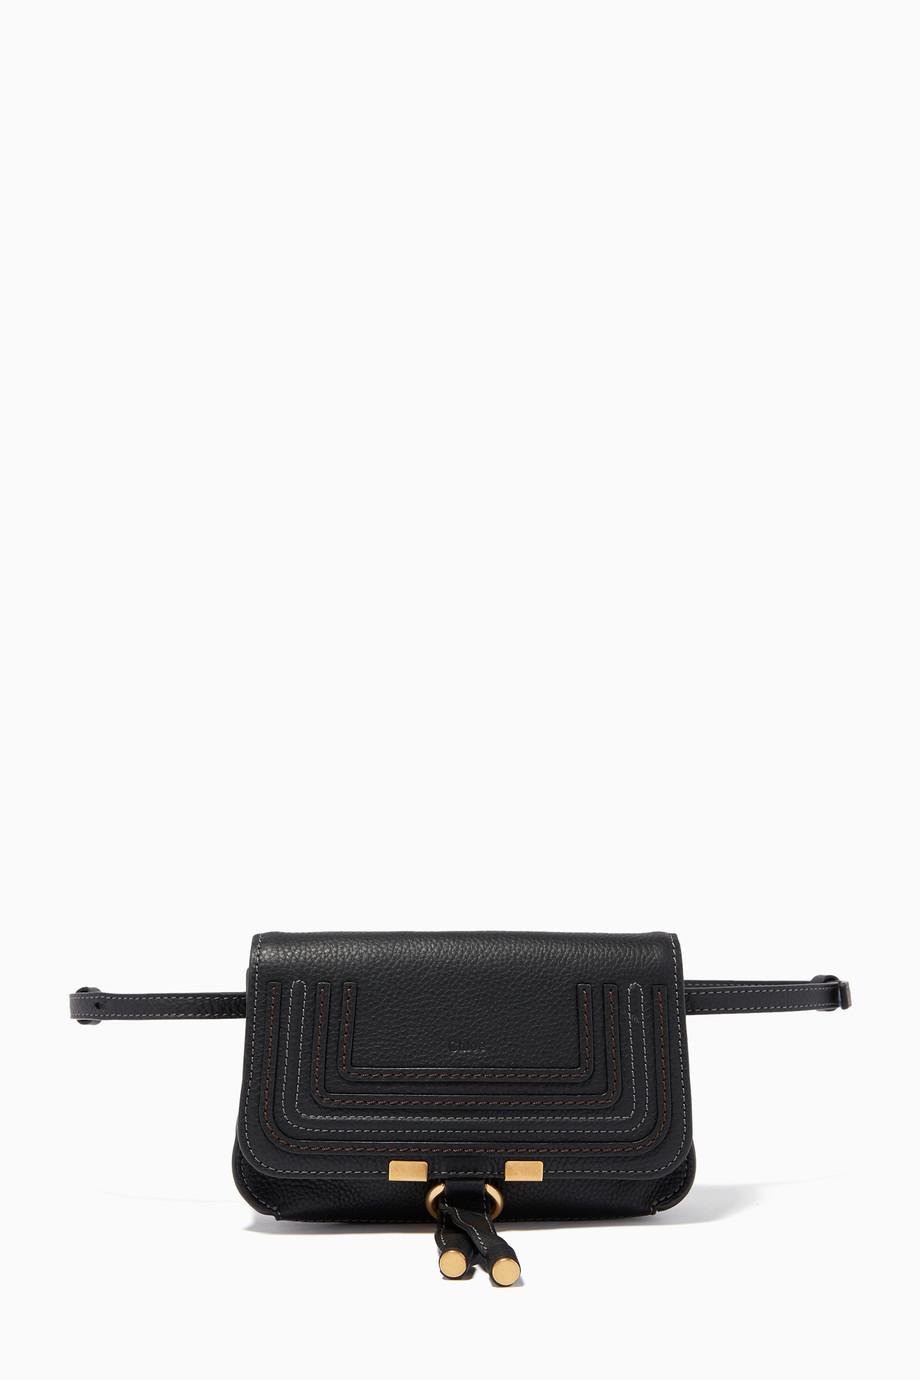 a554cba3 Shop Chloé Black Marcie Calf Leather Belt Bag for Women | Ounass UAE